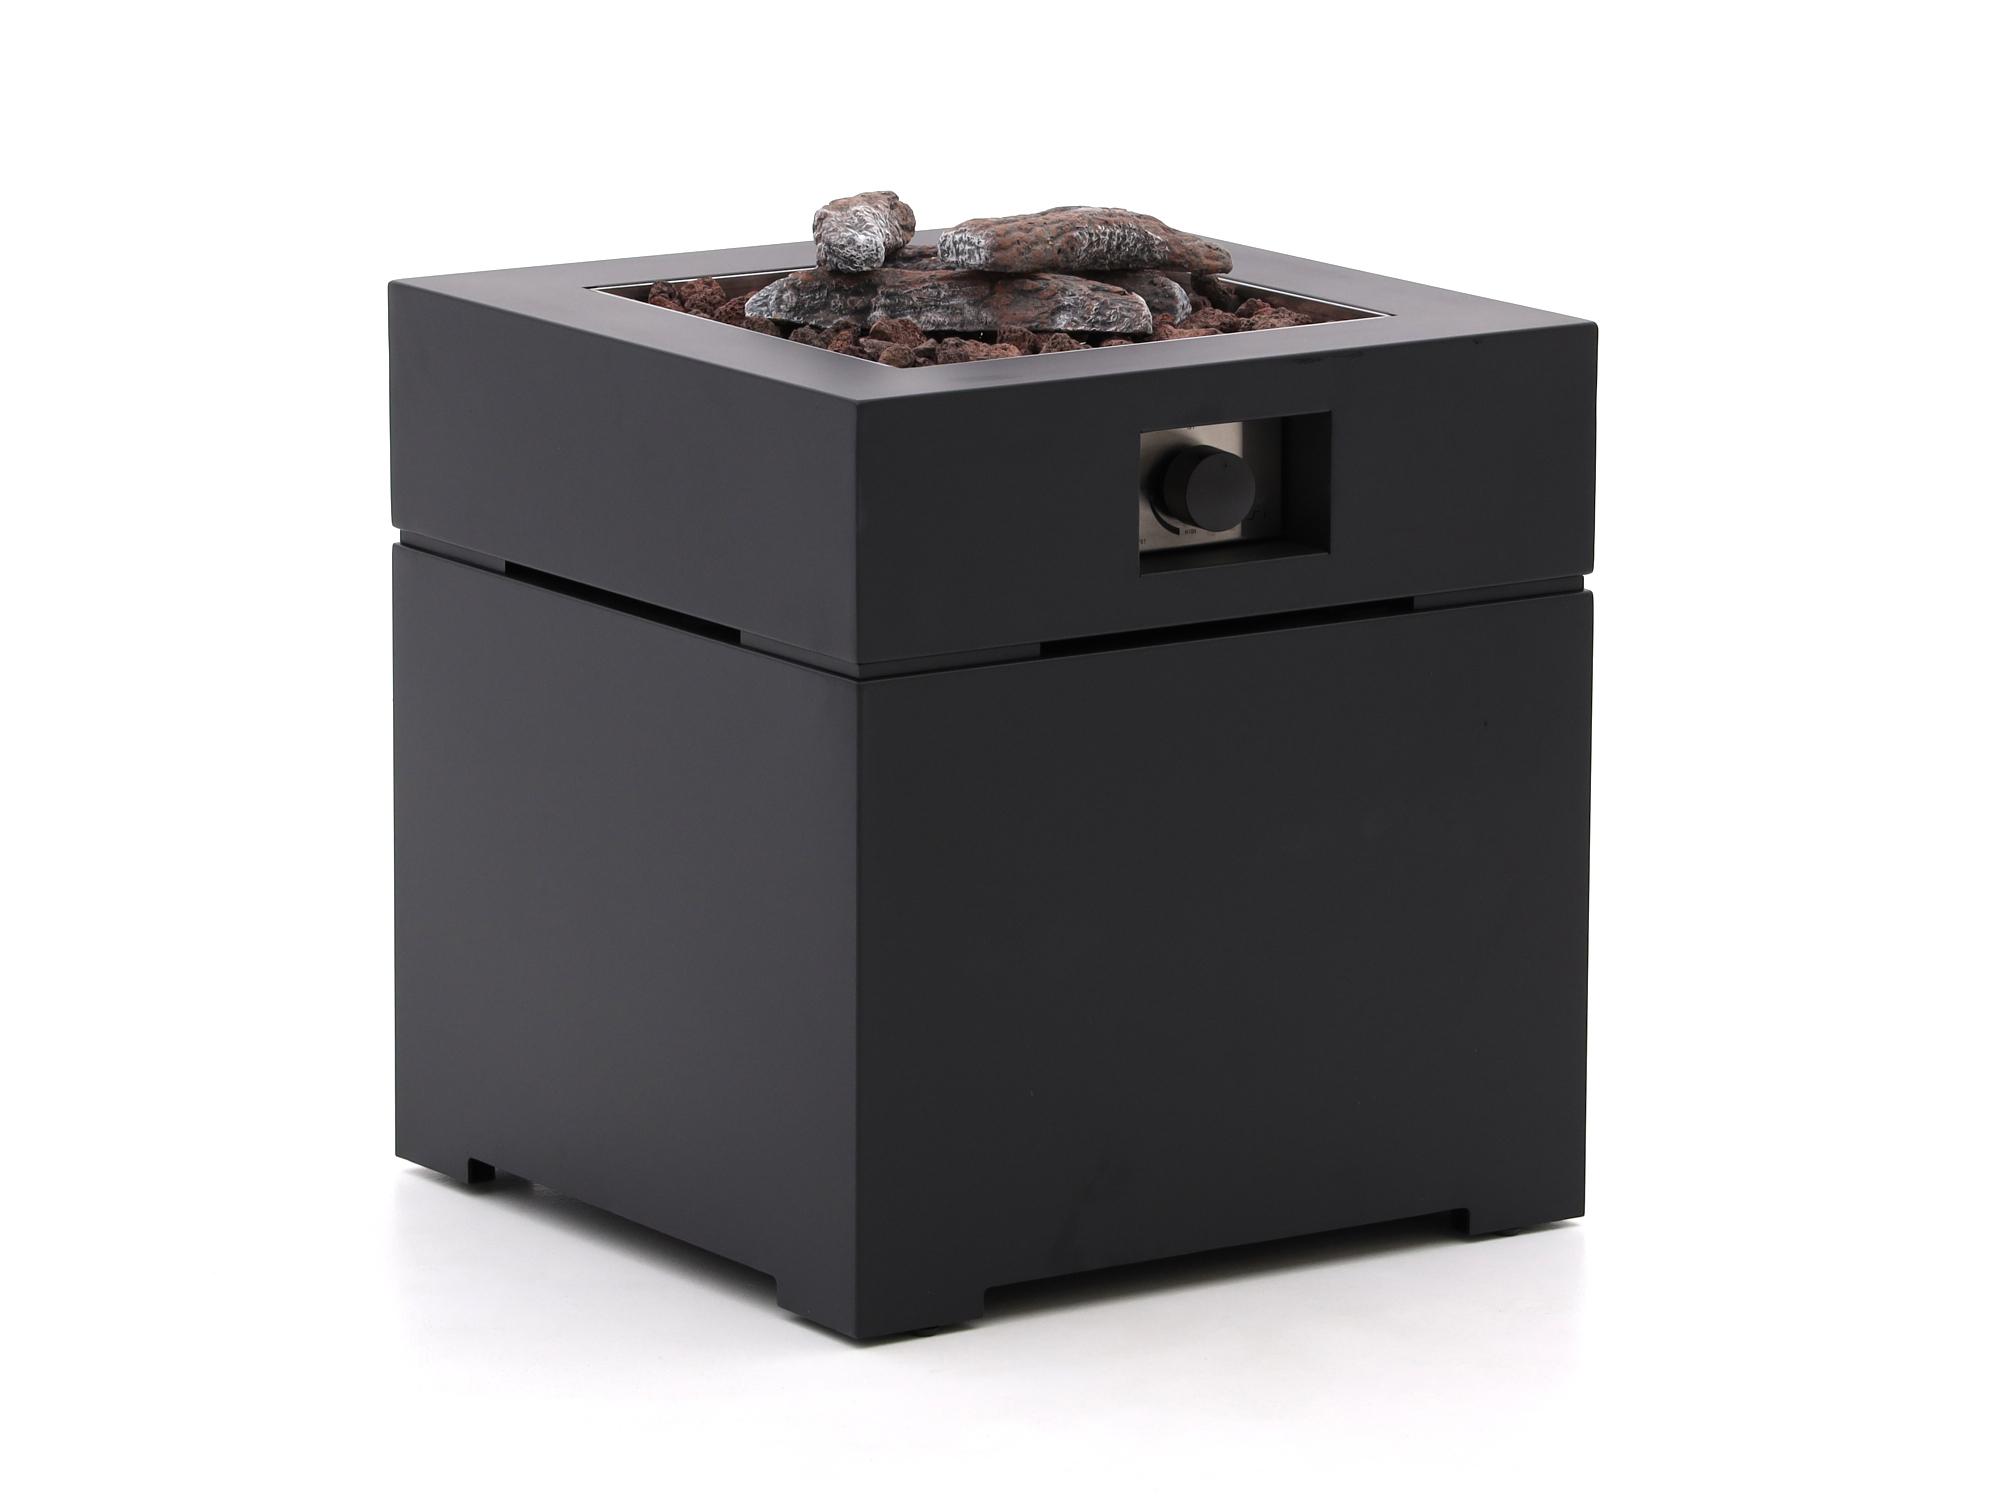 Cosibrixx vuurtafel 60x60x63cm - Laagste prijsgarantie!